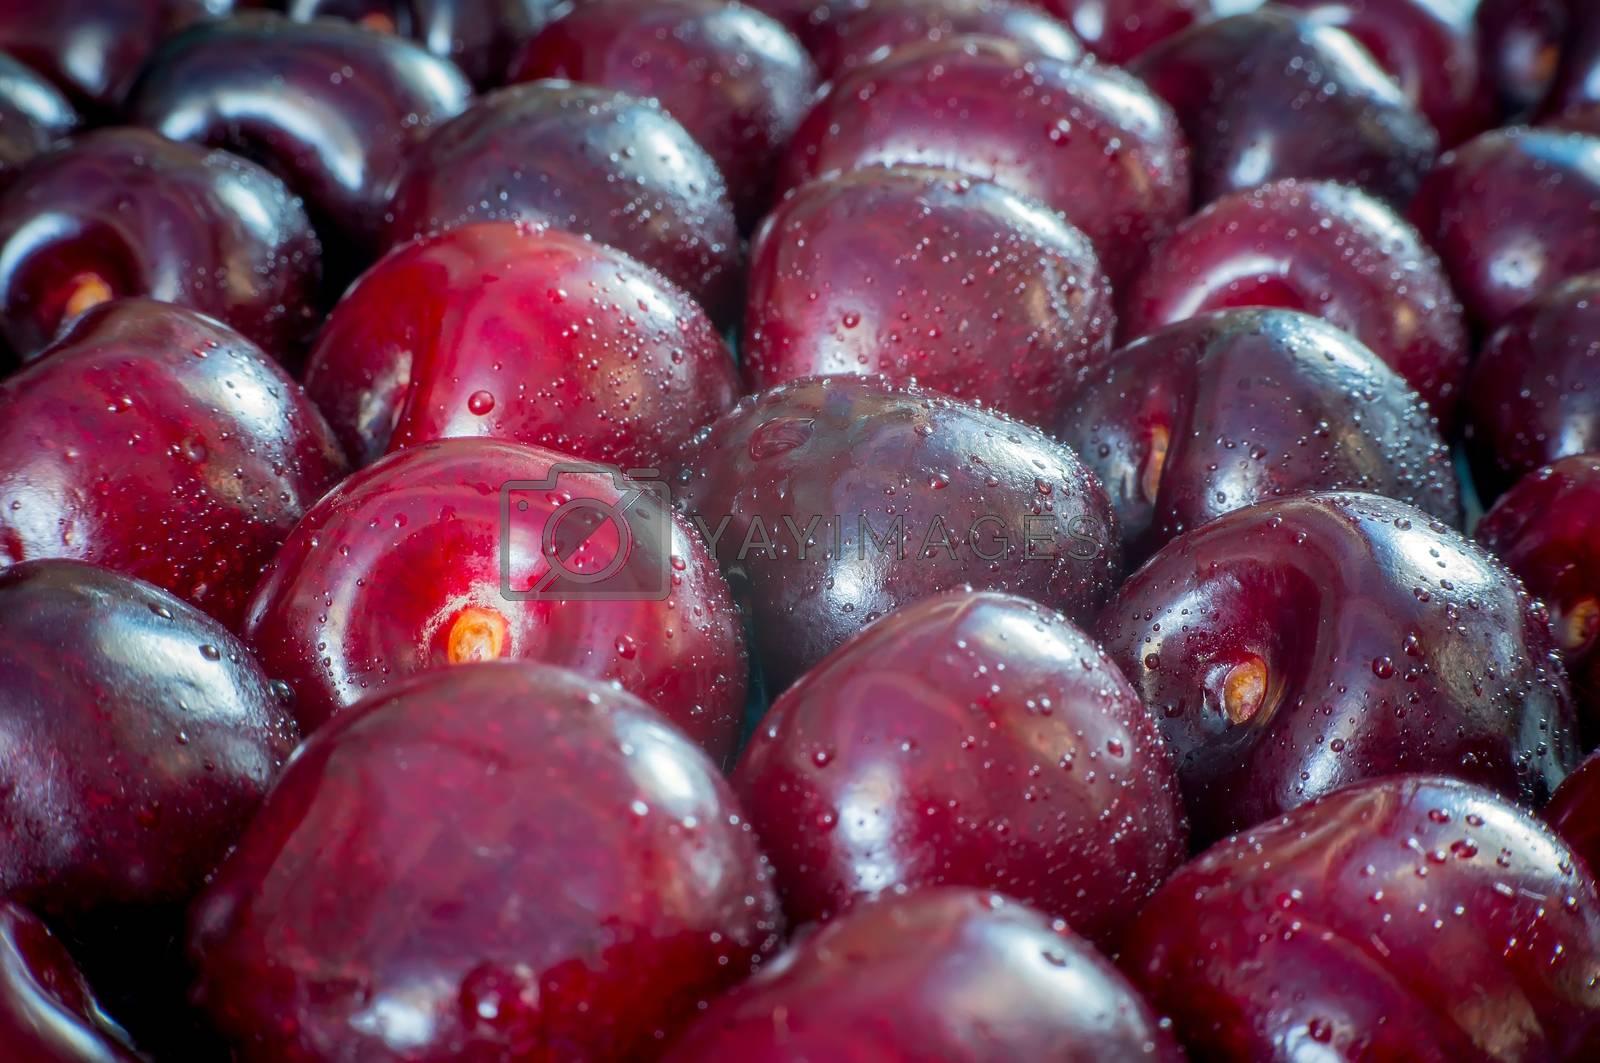 Burgundy cherry closeup dark background. sour cherries, close-up view